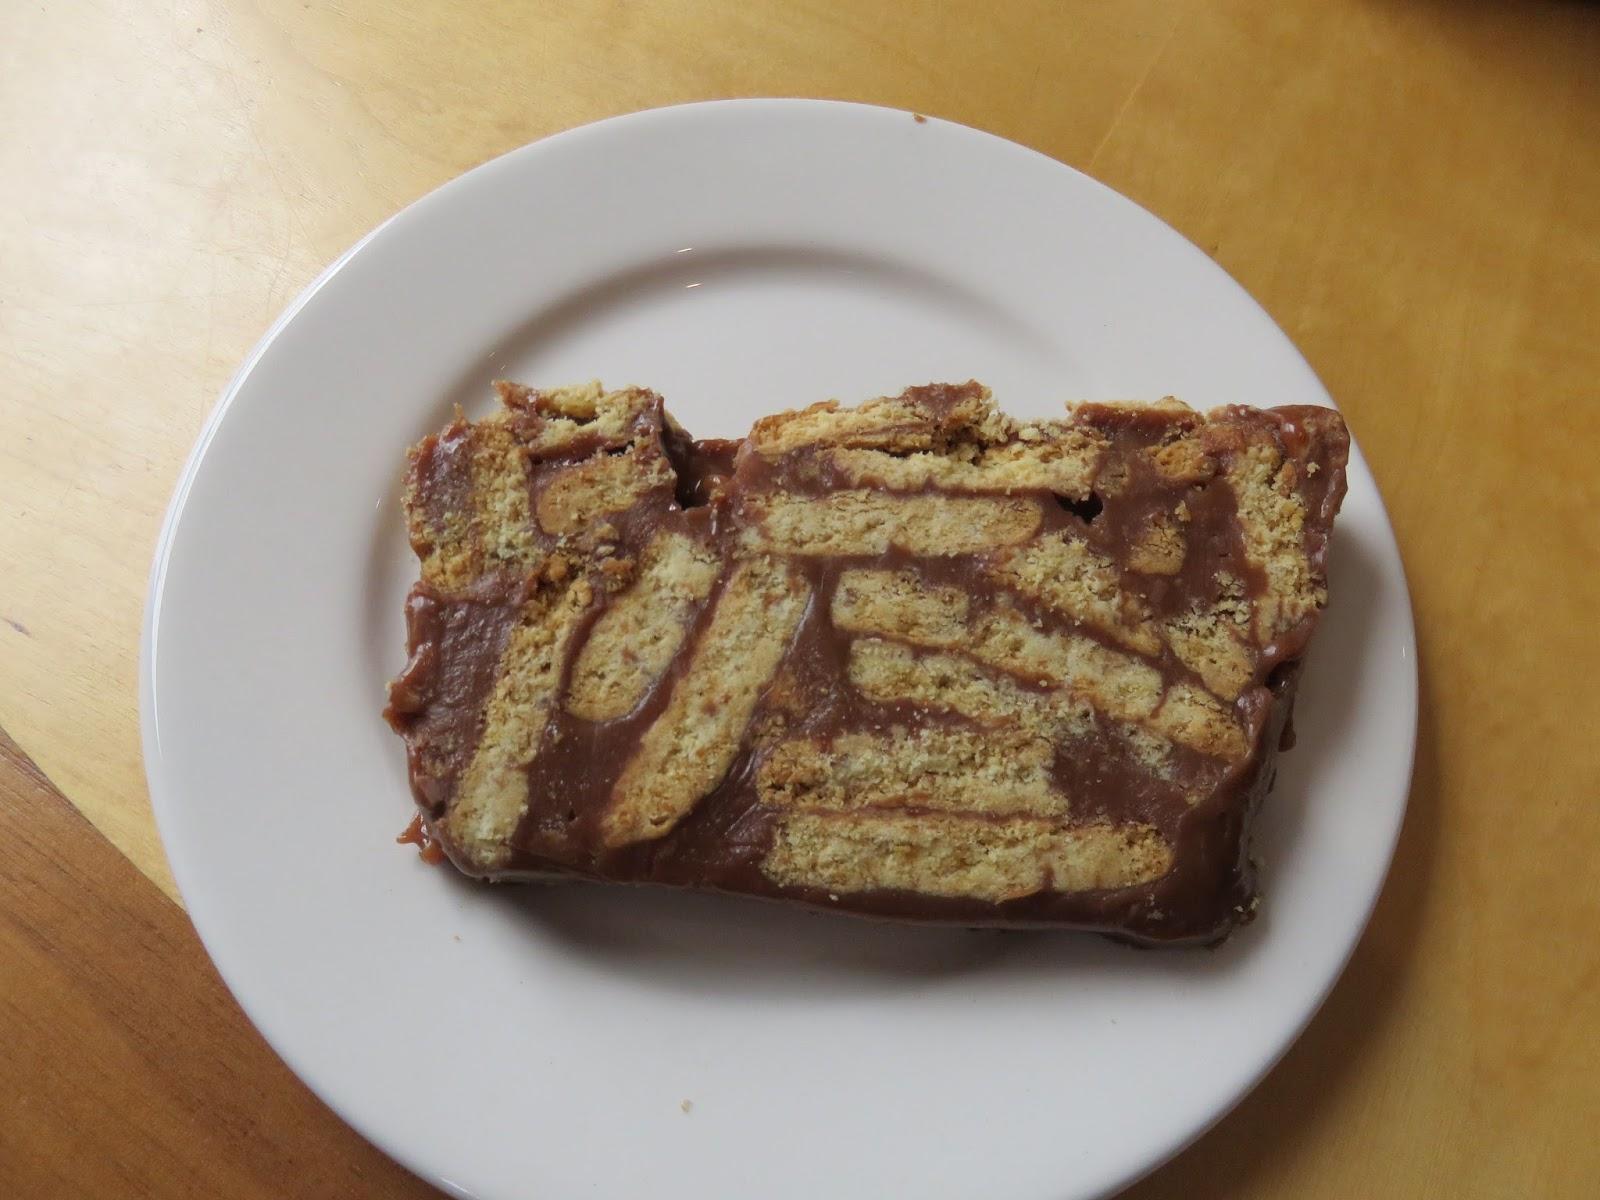 Ireland Am Chocolate Biscuit Cake